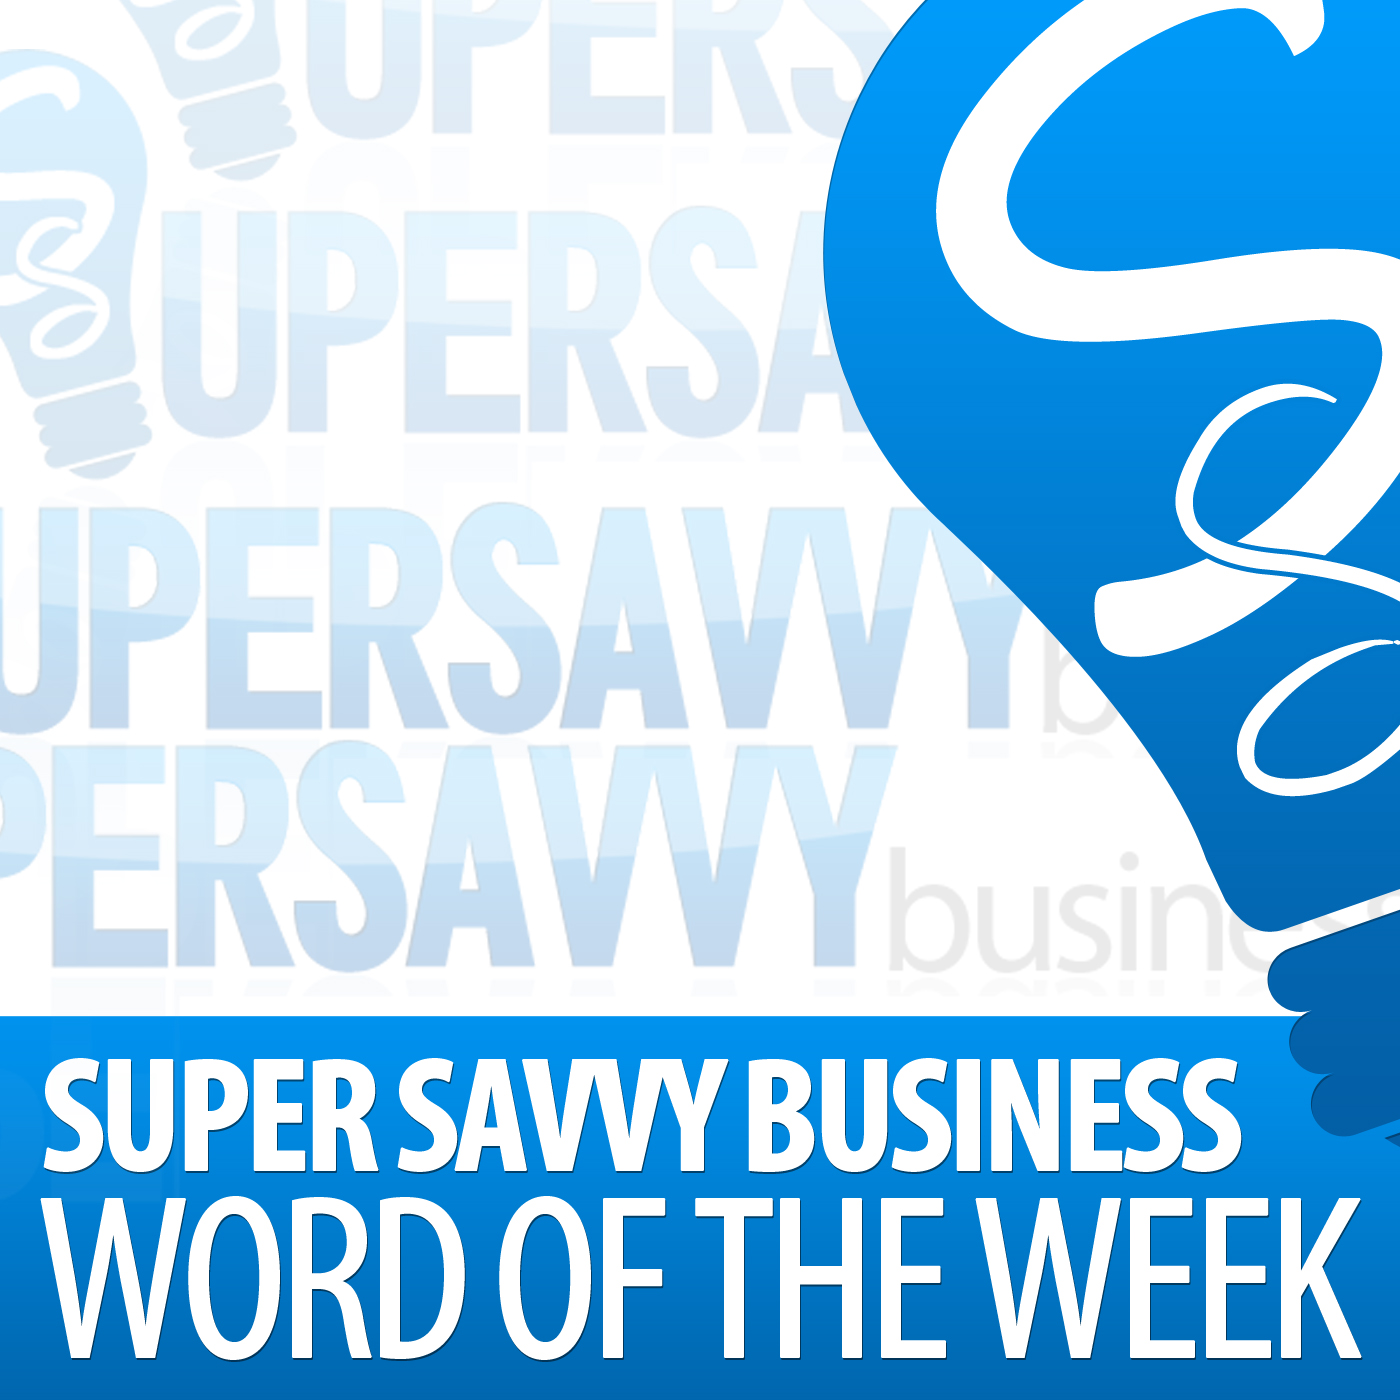 Super Savvy Business | Digital Marketing Agency Sydney